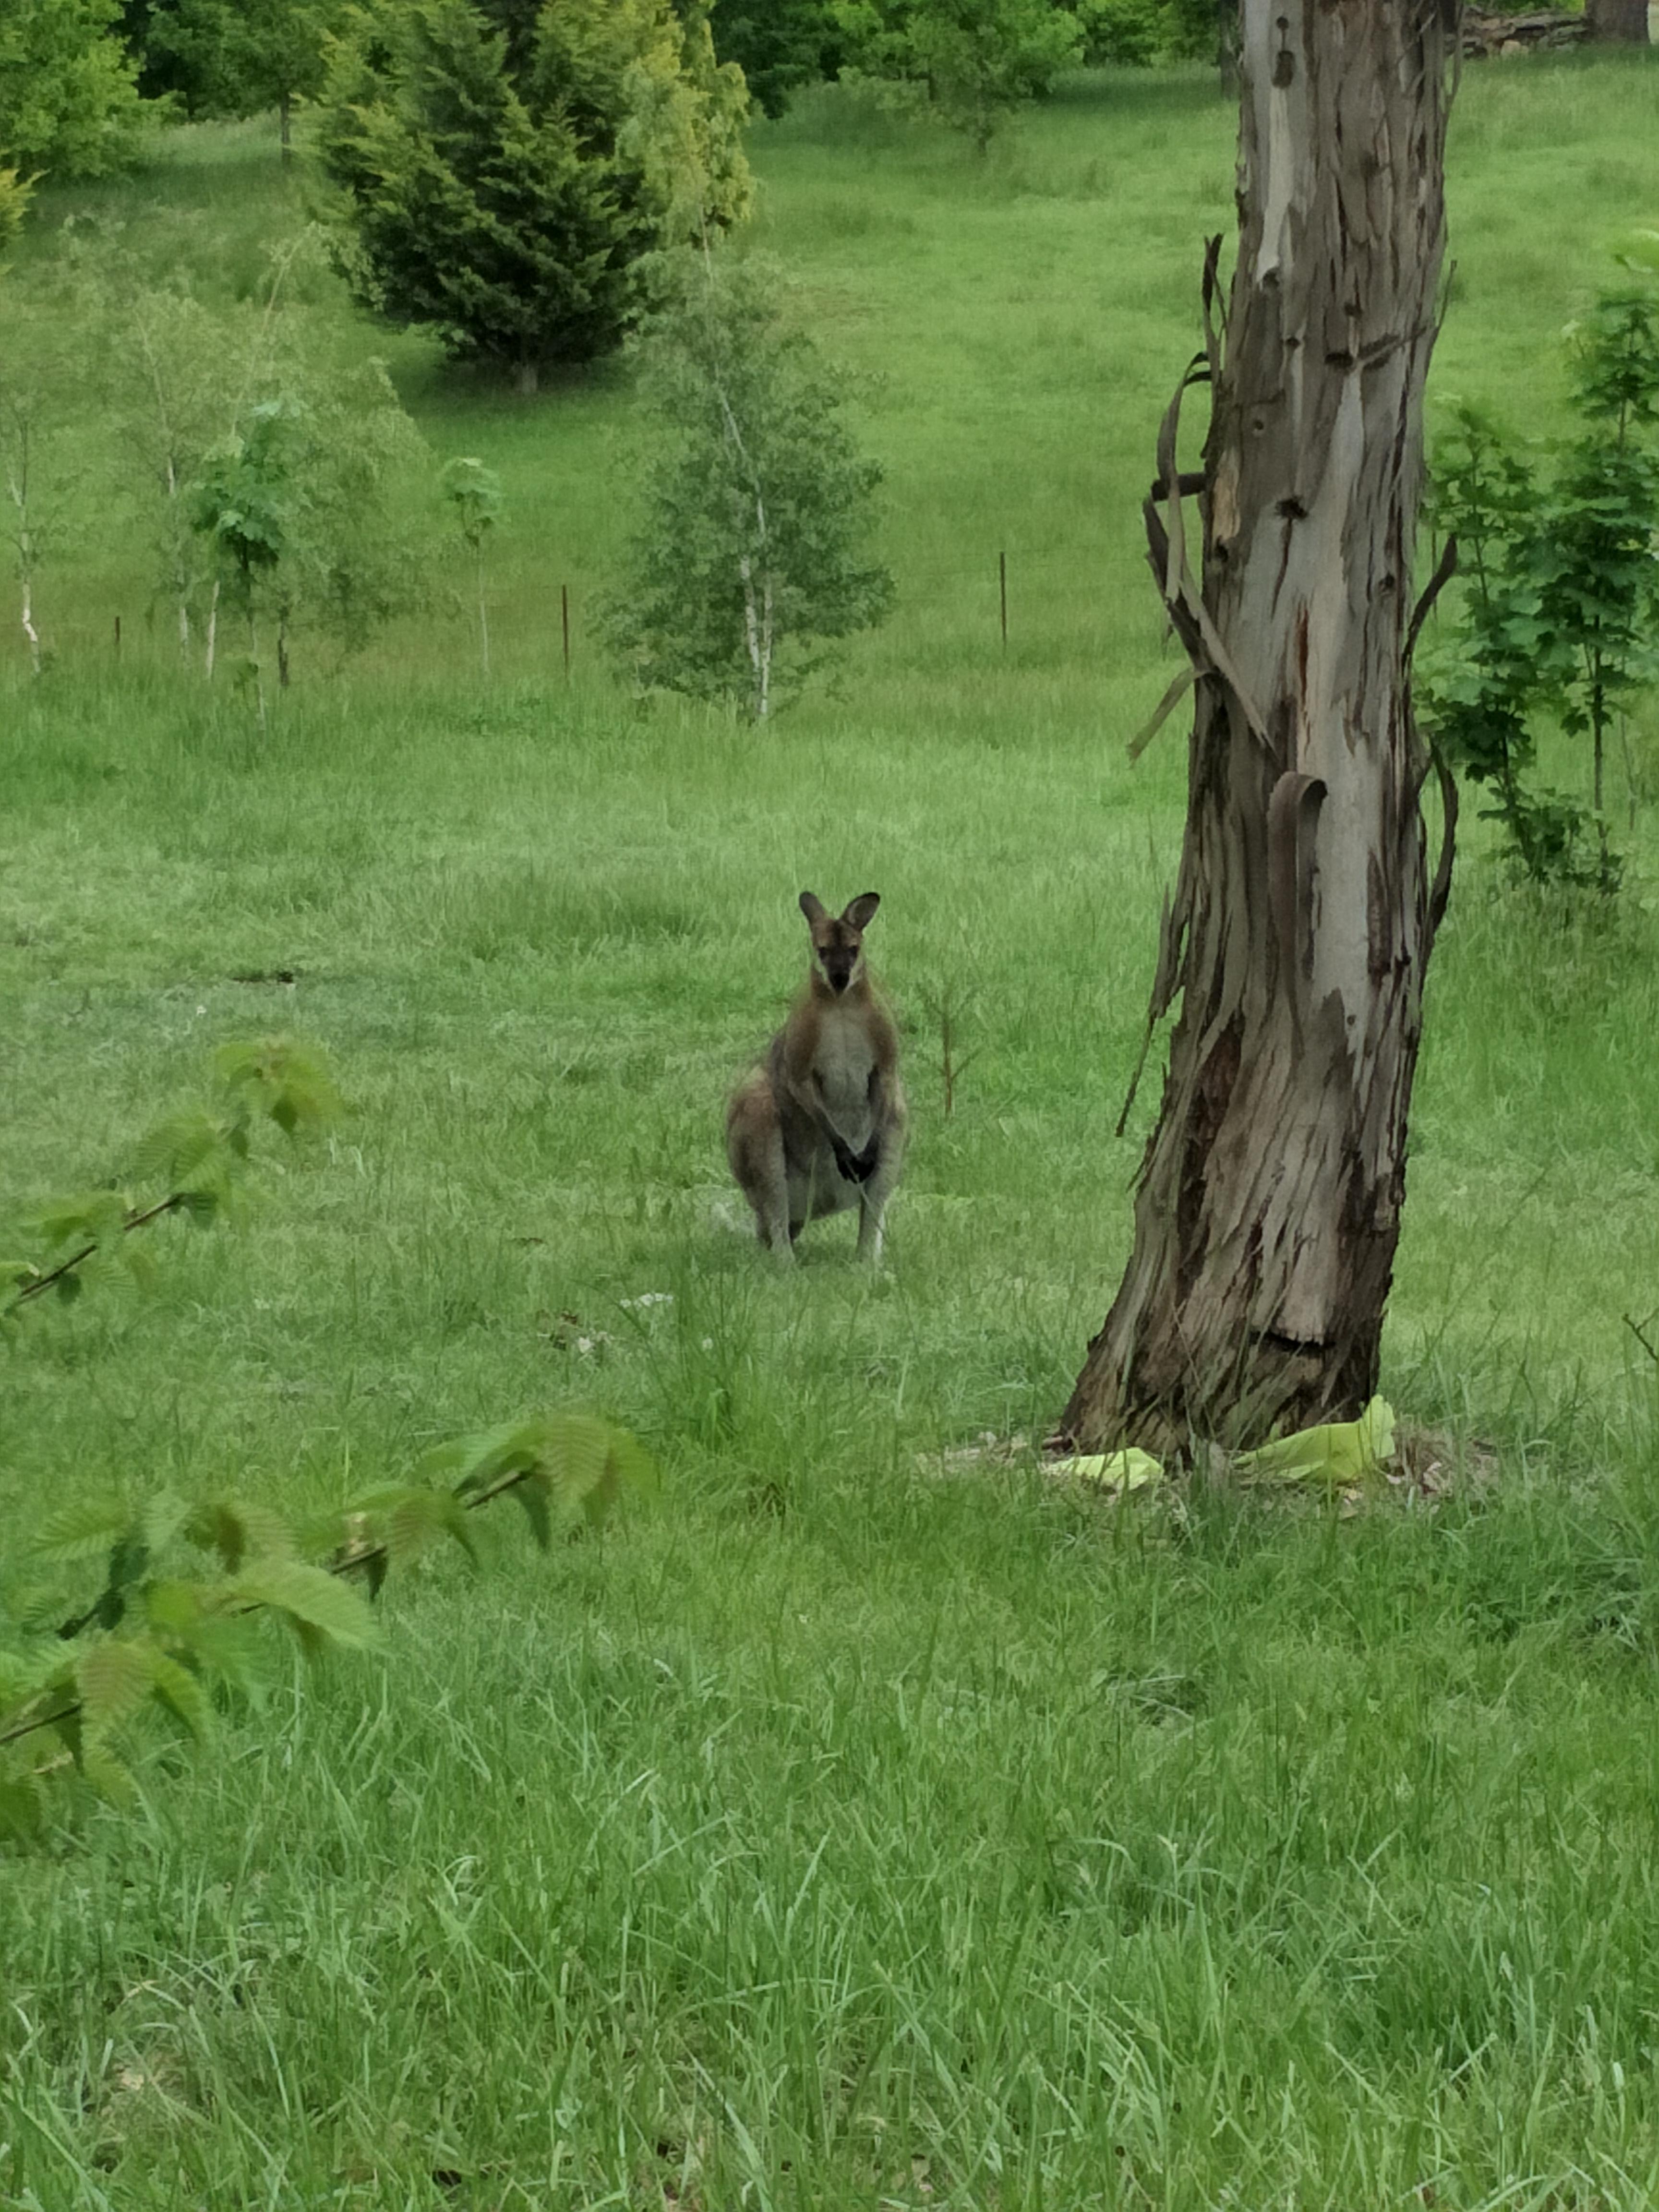 Lisa the Wallaby